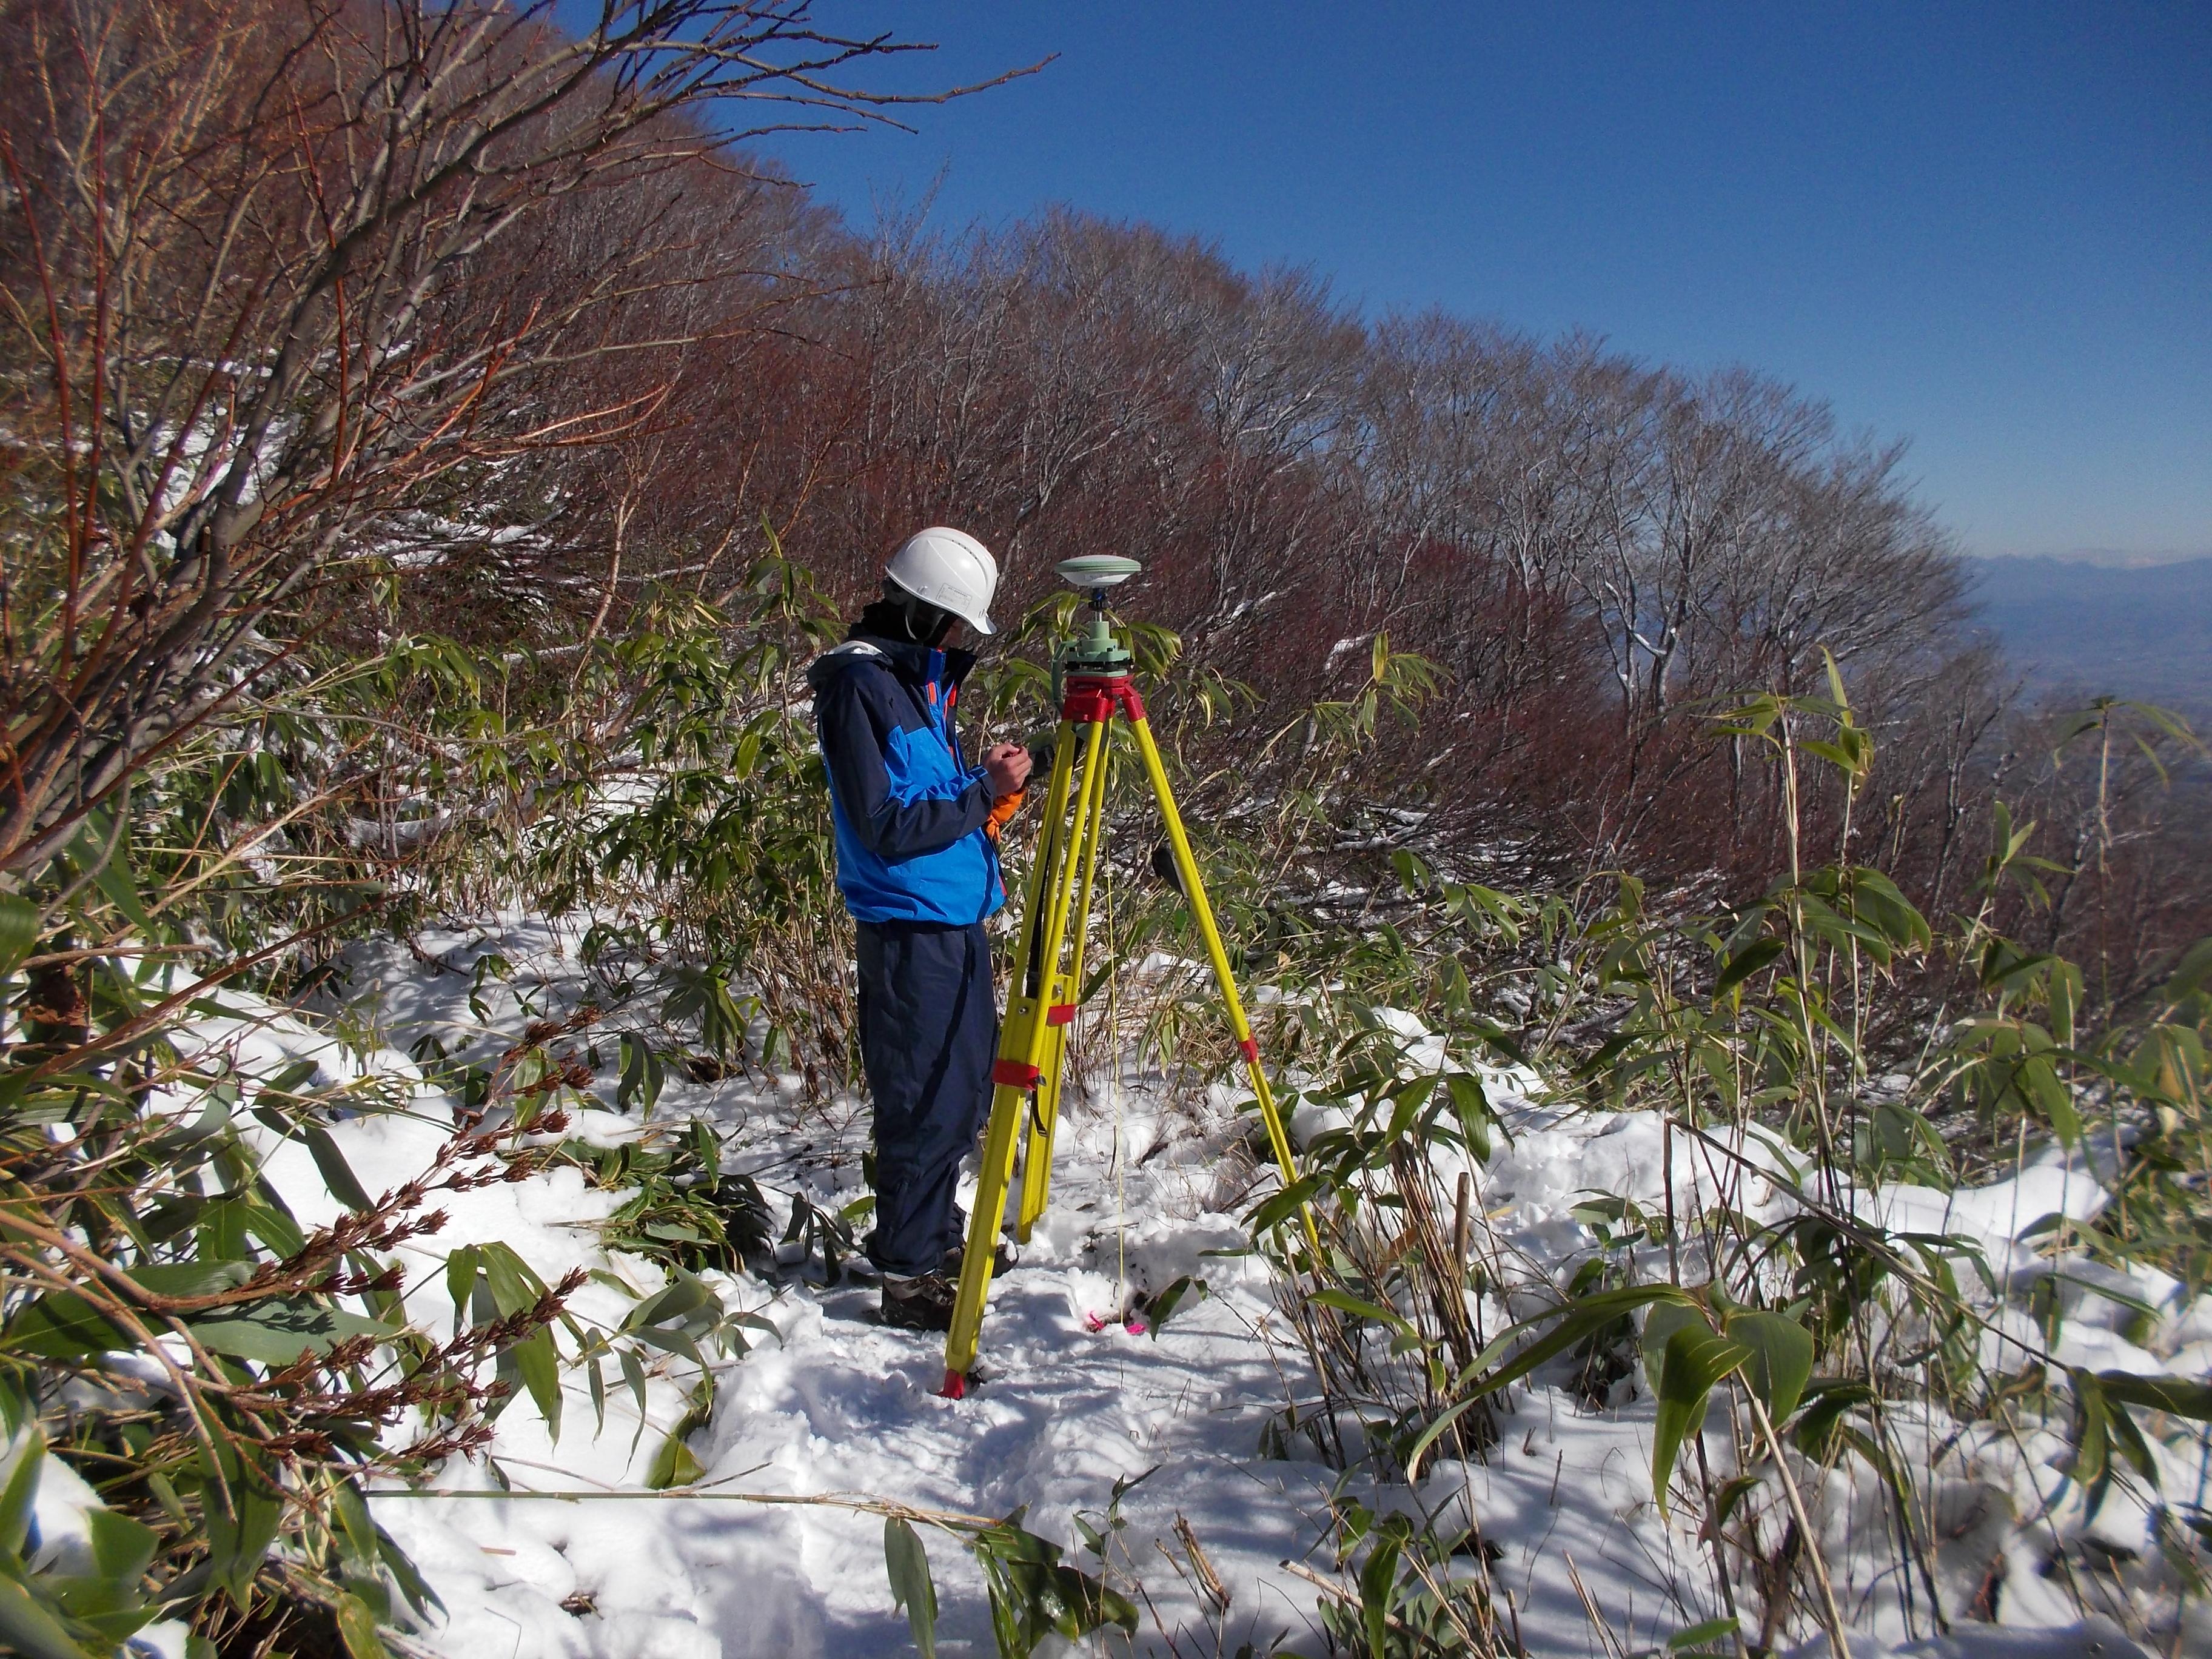 47火山観測整備に伴う用地測量業務(仙台管区)